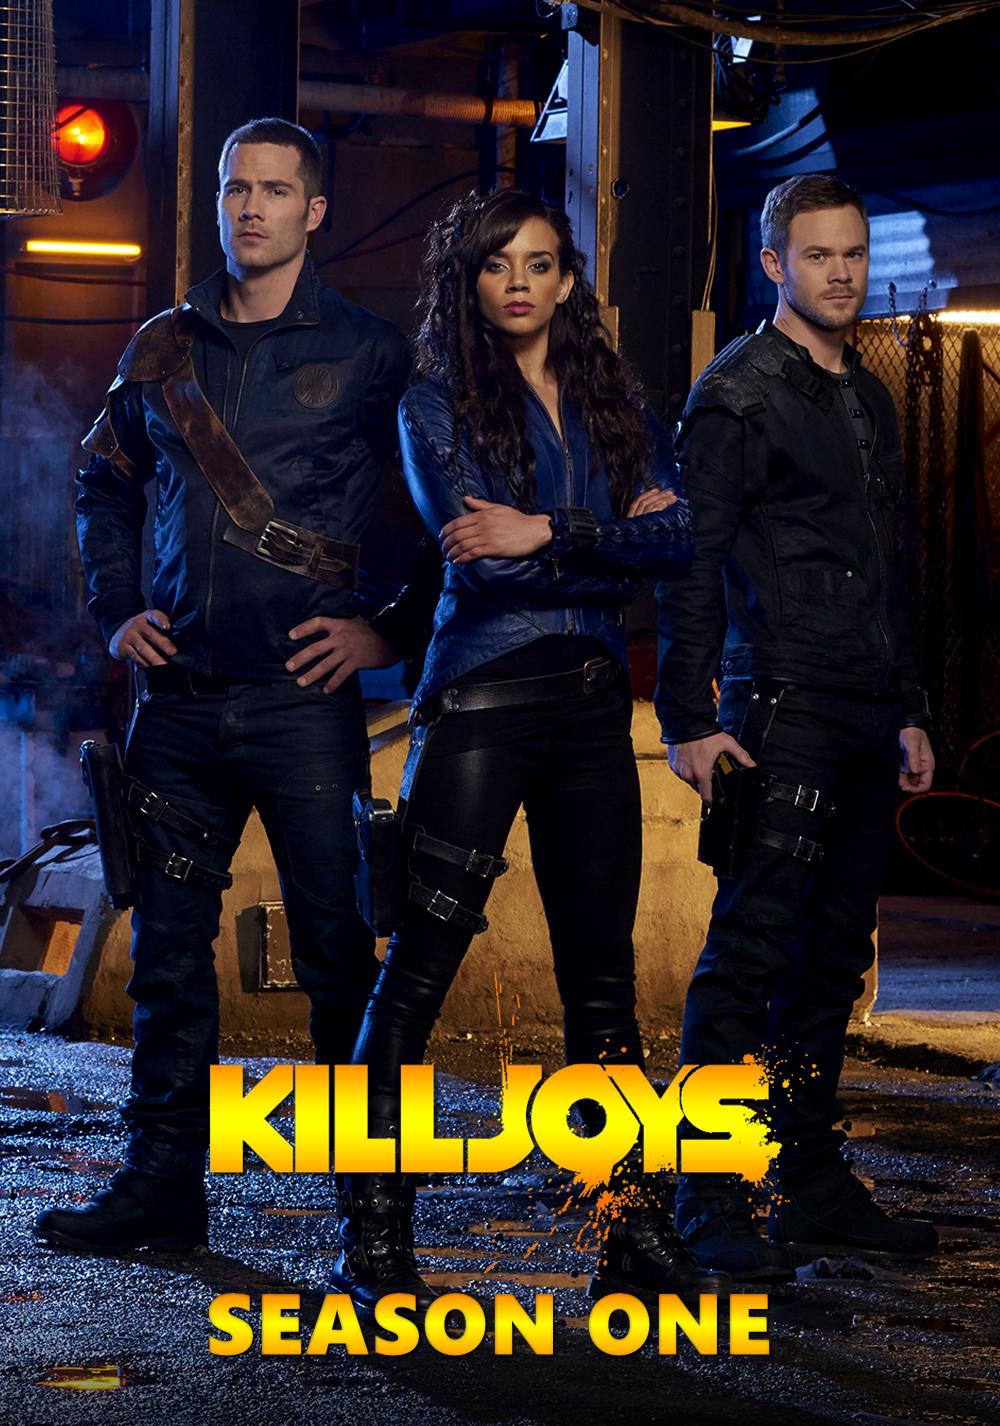 Killjoy Serie